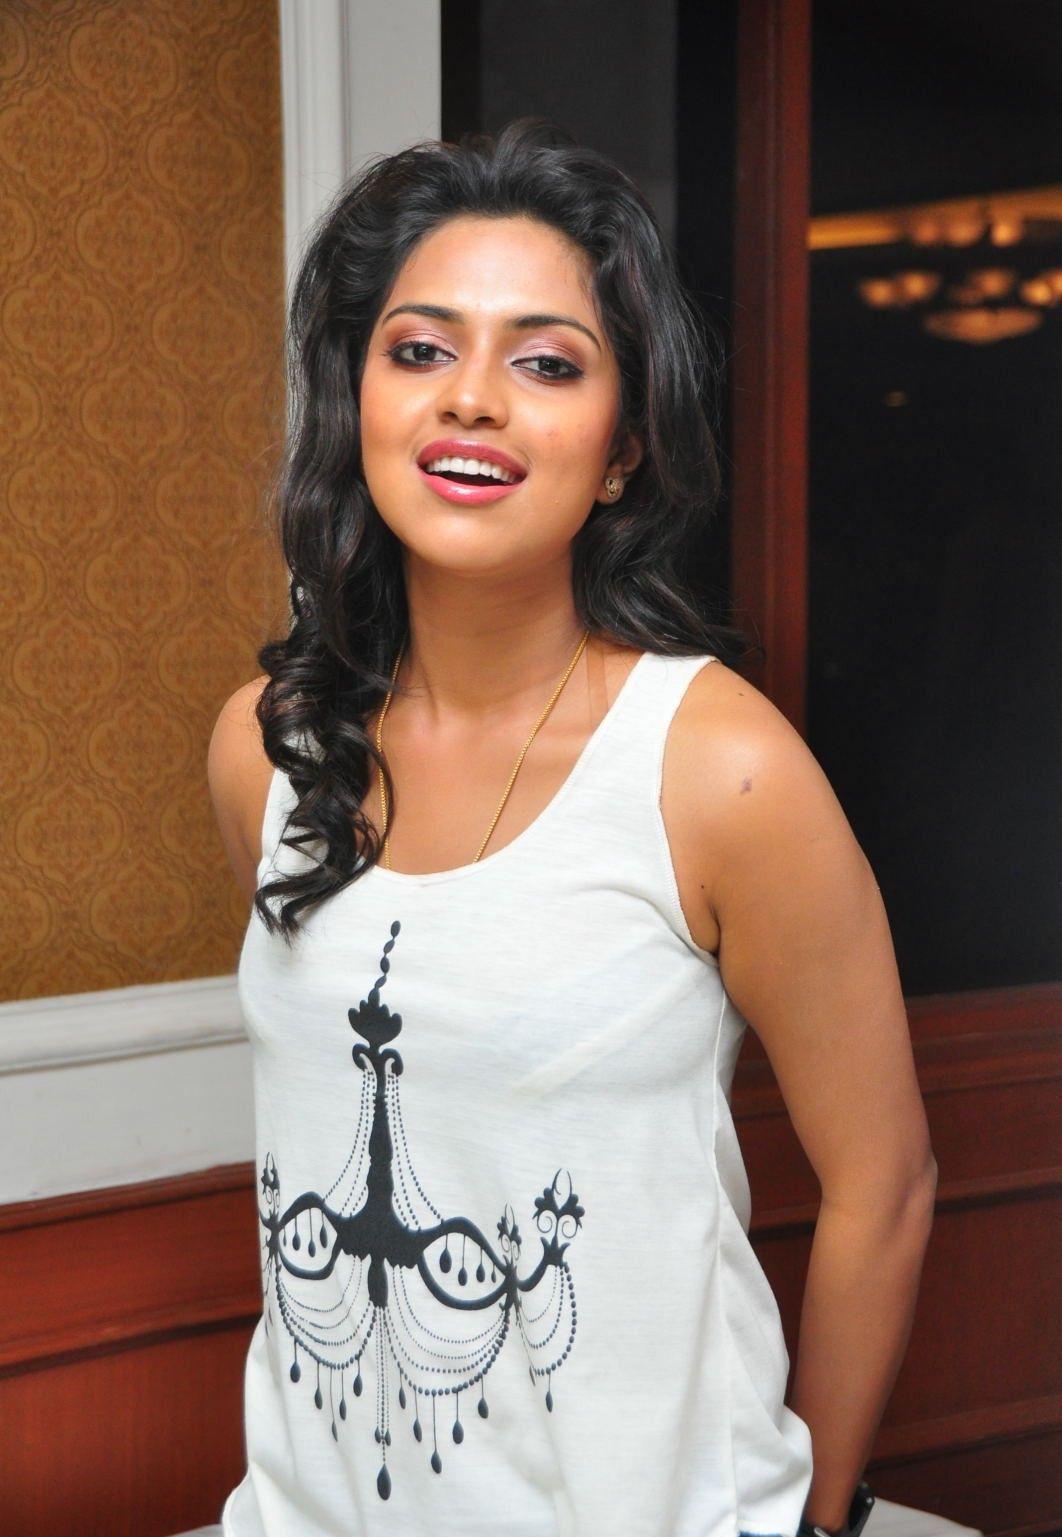 Beautiful Tamil Girl Amala Paul Stills in White Dress Blue Jeans